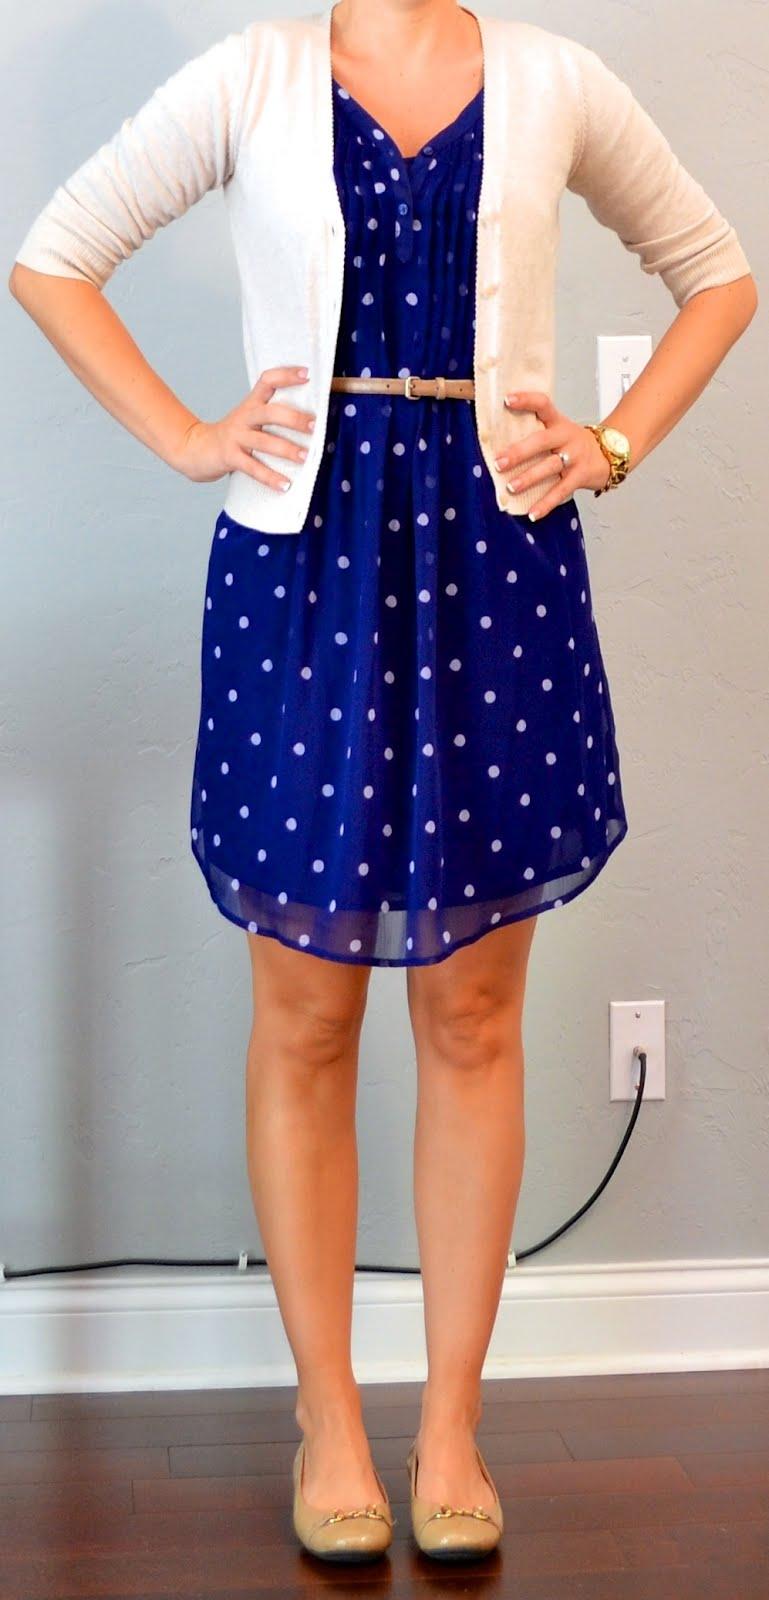 Outfit Post: Polka Dot Dress, Cream Cardigan, Gold Belt